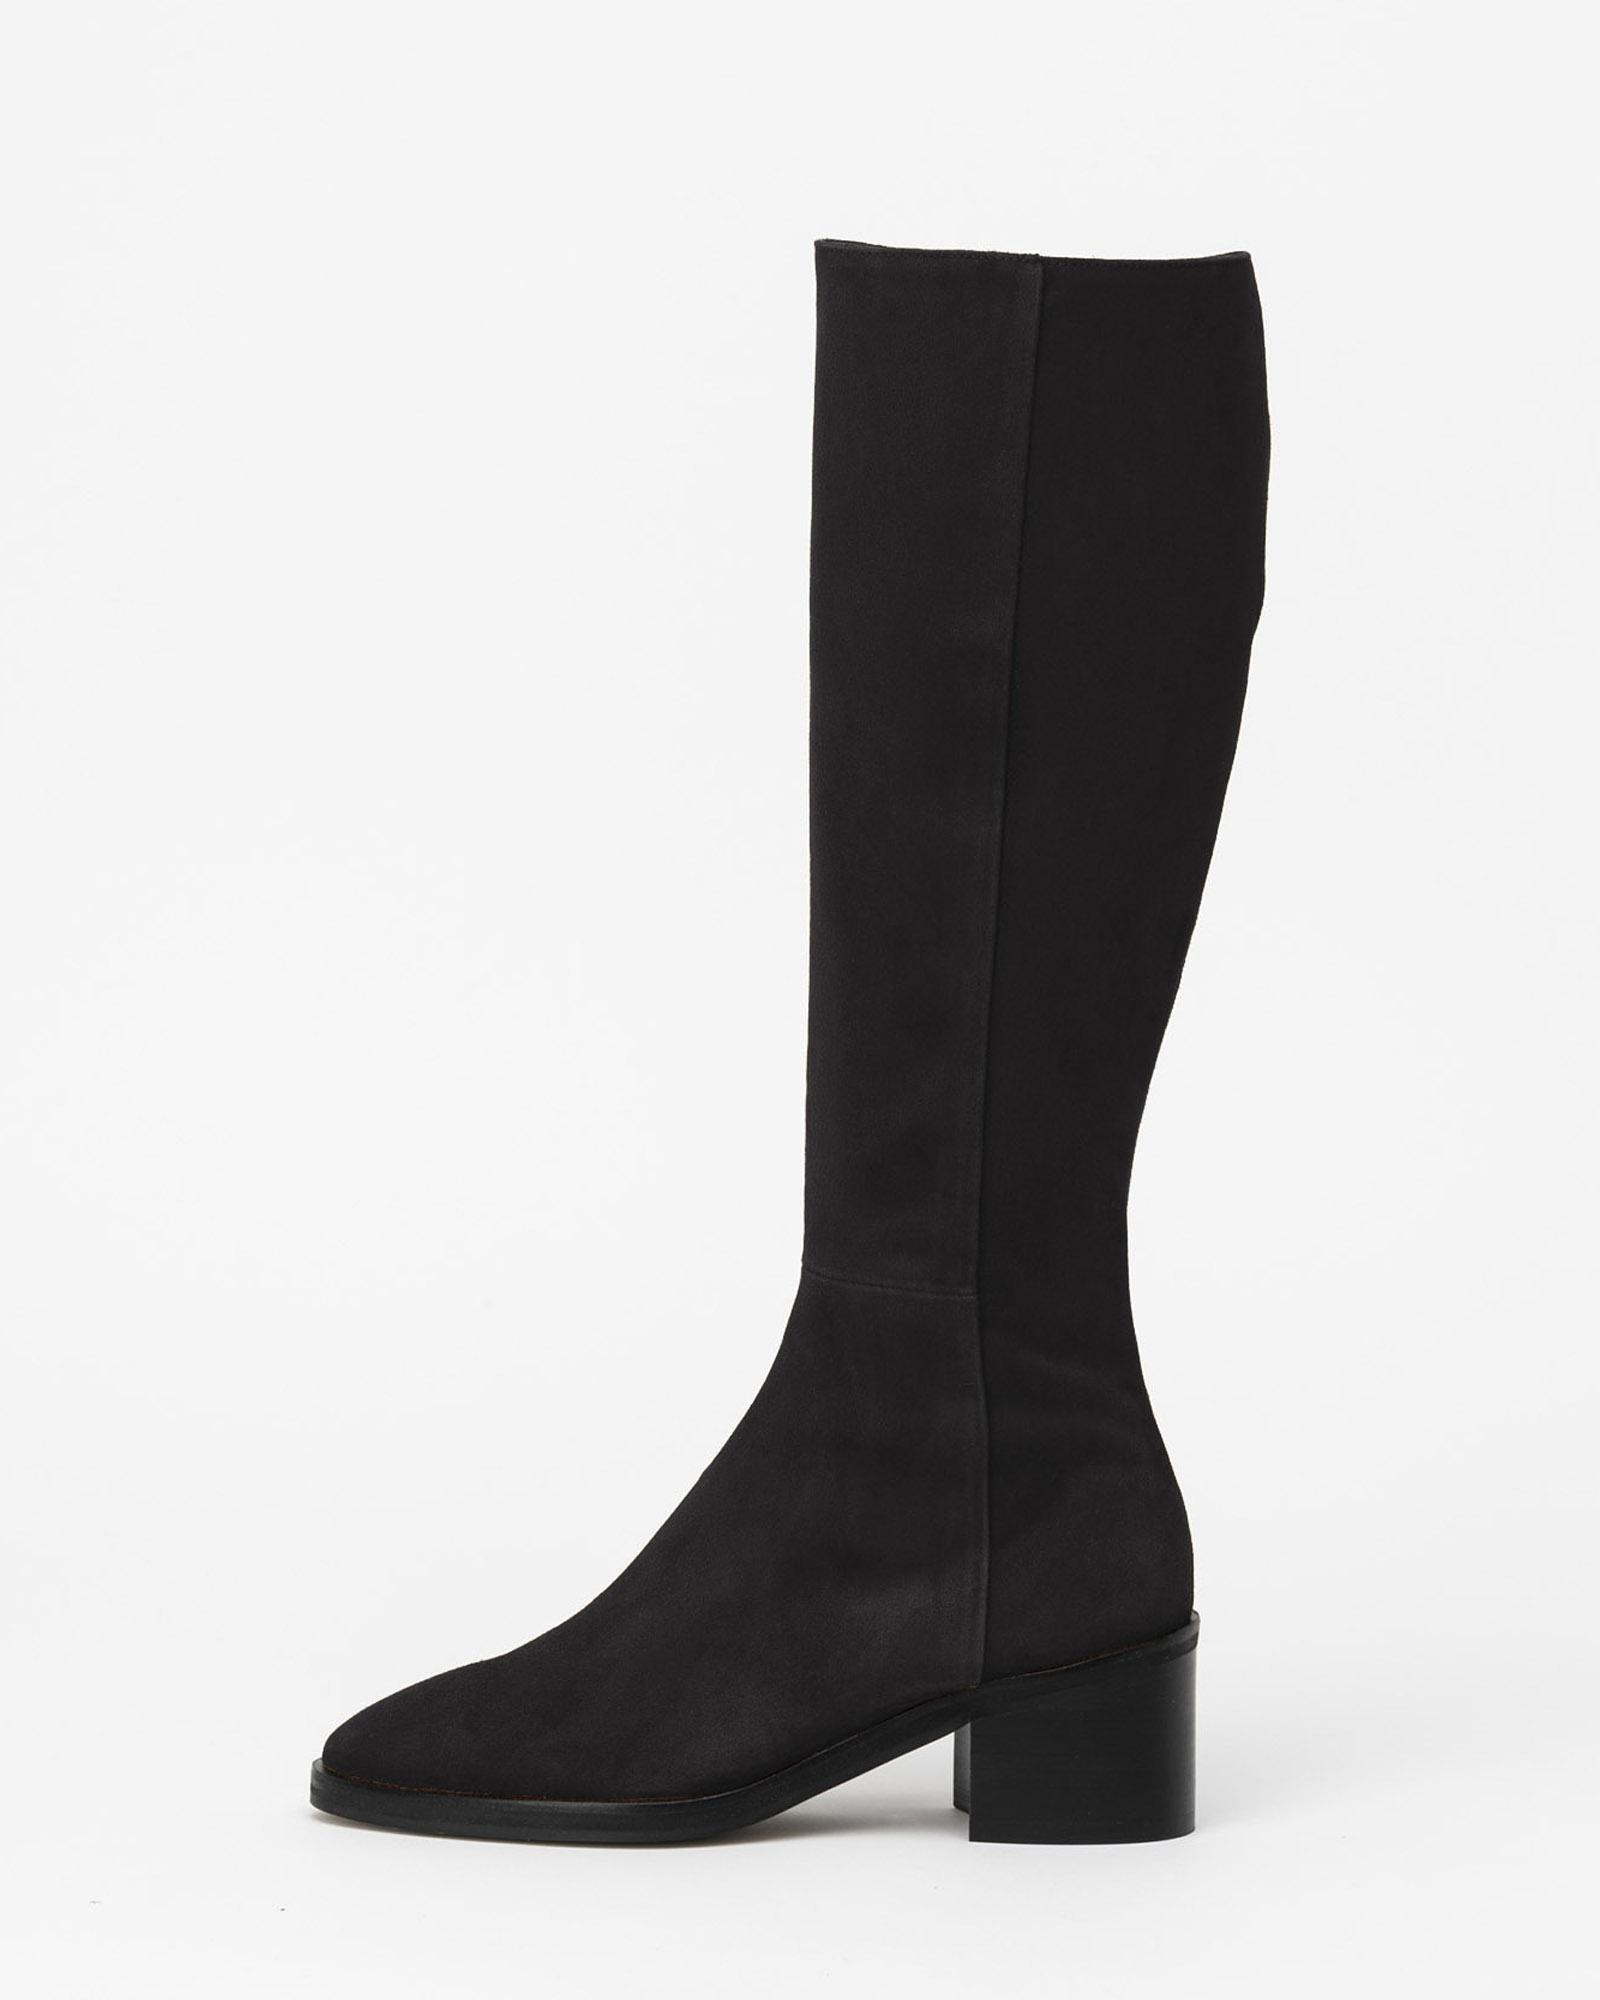 Fuller Boots in Chestnet Black Suede